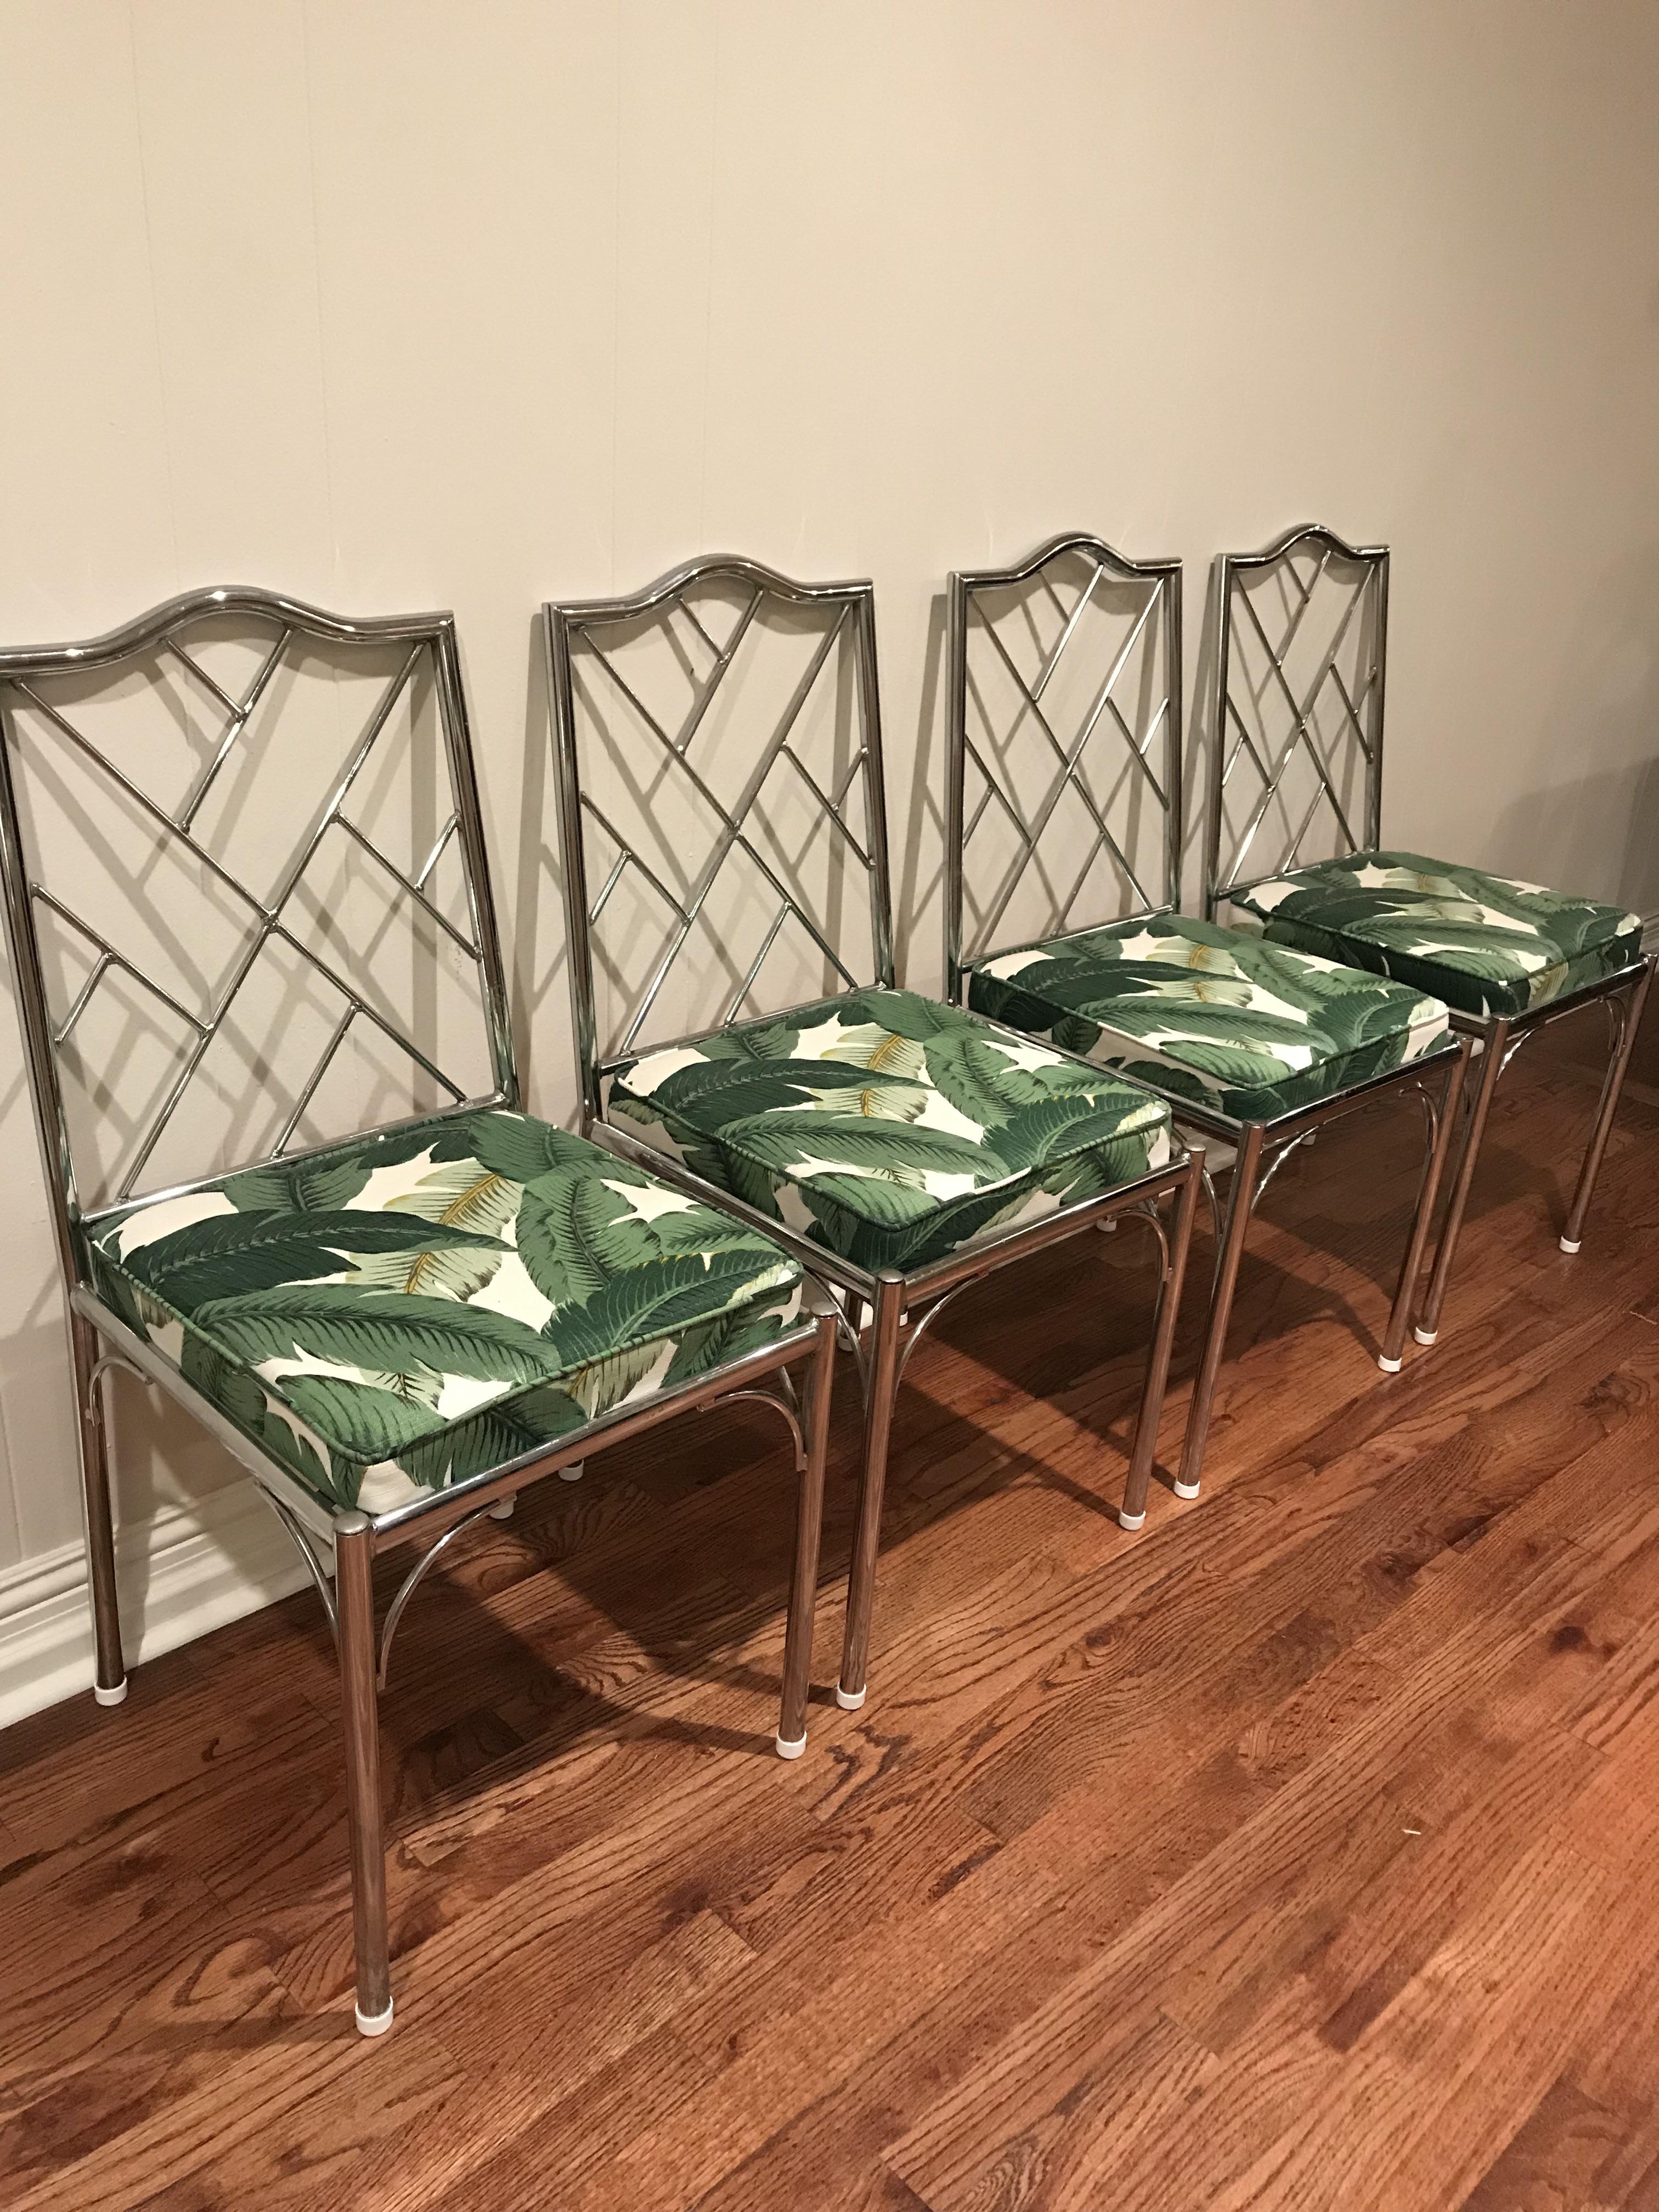 Boho Chic Palm Leaf Fabric U0026 Chrome Dining Room Chairs   Set Of 4 For Sale